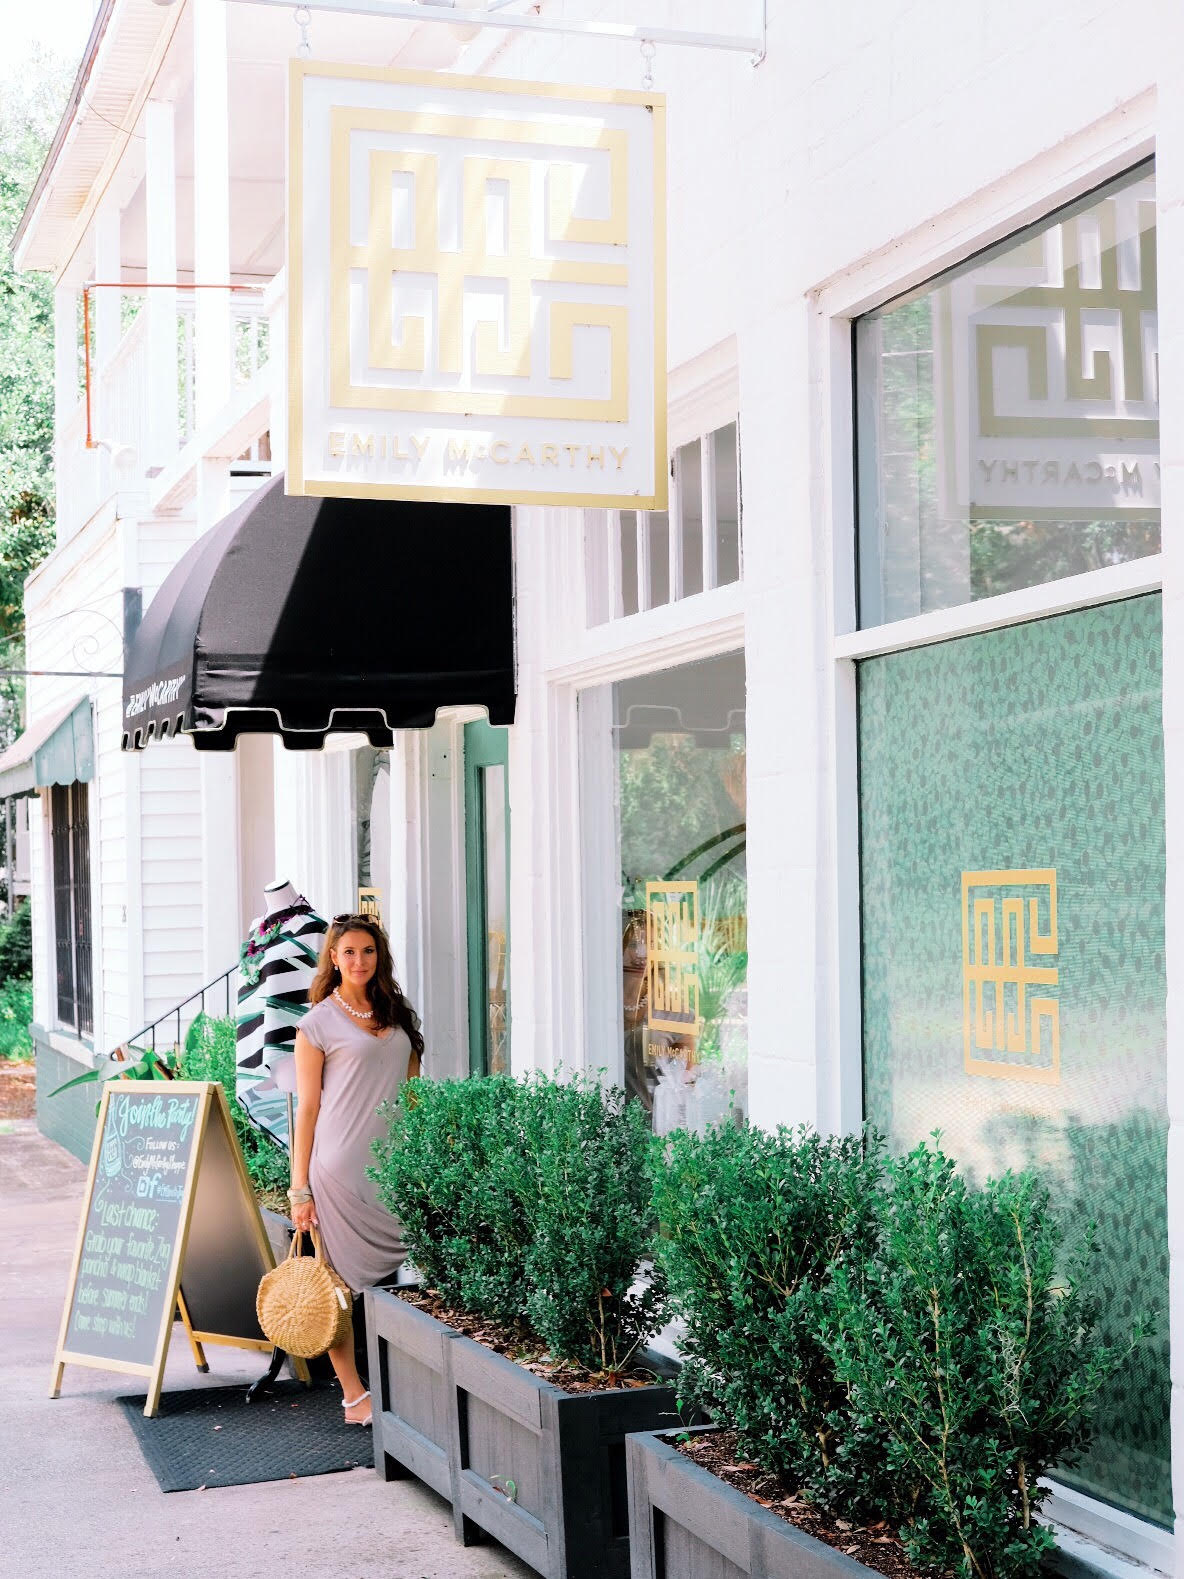 Brenna Lauren Michaels at Emily McCarthy Shoppe in Savannah GA